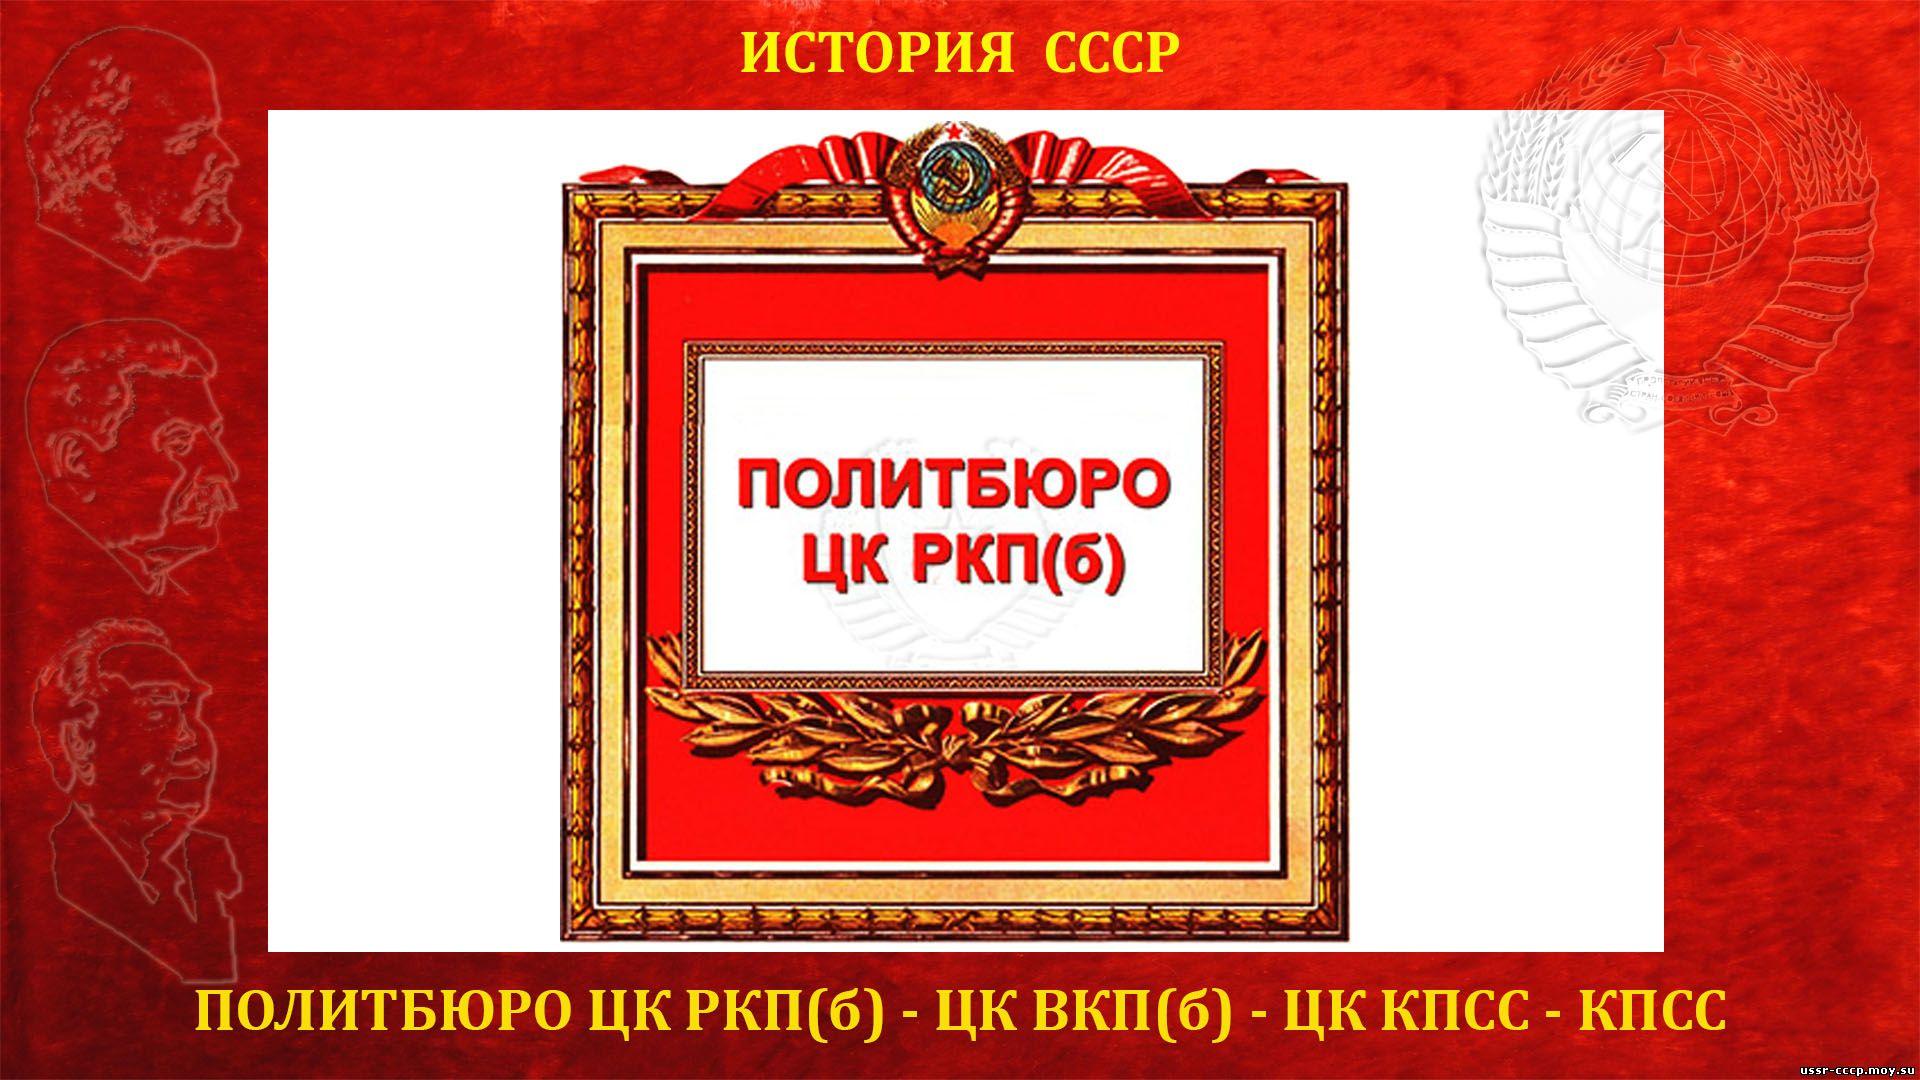 Политбюро ЦК РКП(б) — Политическое бюро ЦК РКП(б) (1917—1925) полное повествование))